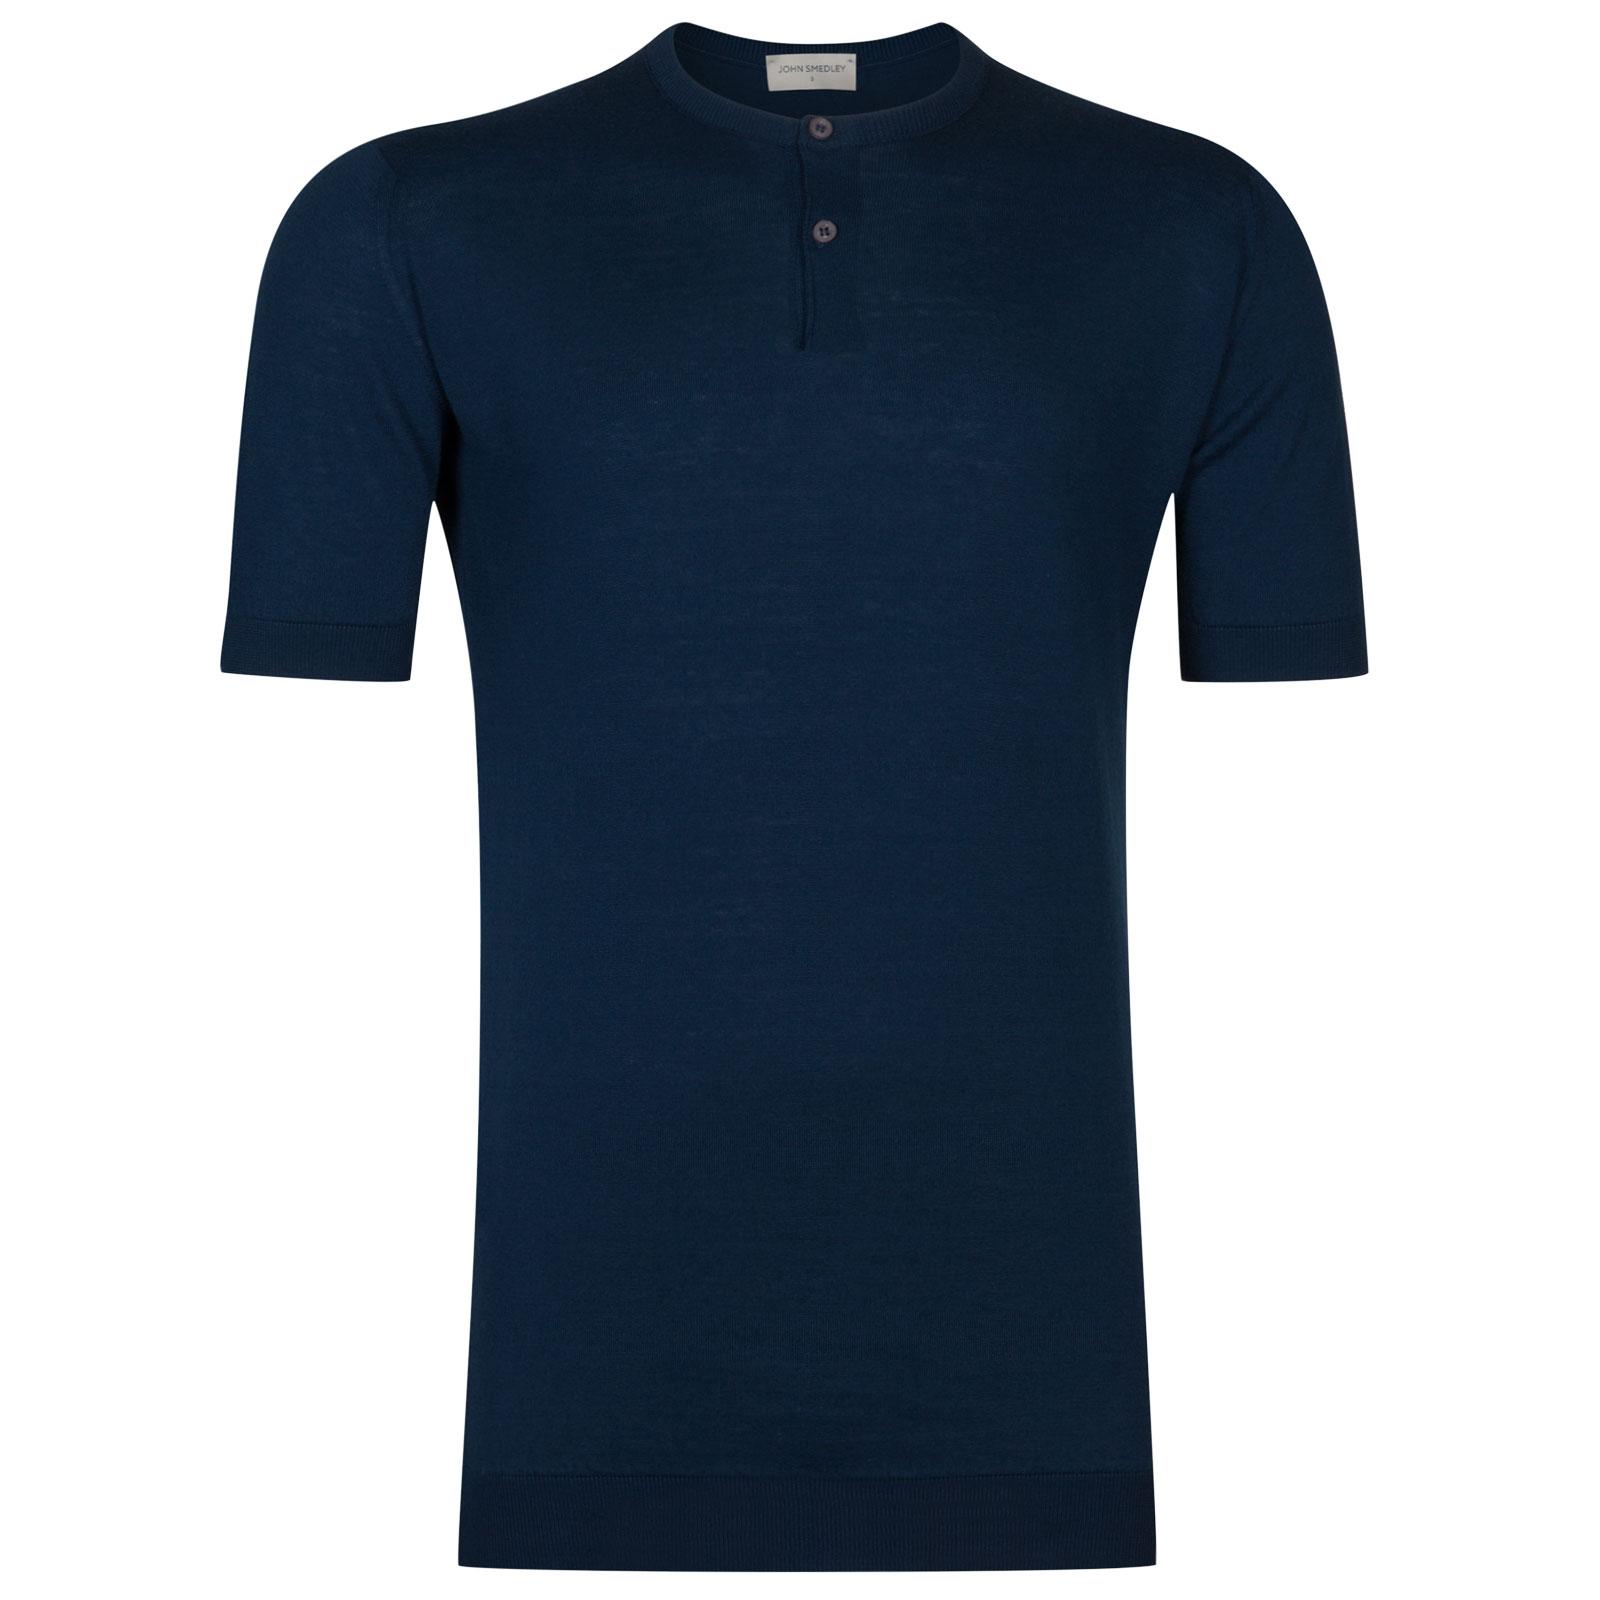 John Smedley Bennett Sea Island Cotton T-shirt in Indigo-M